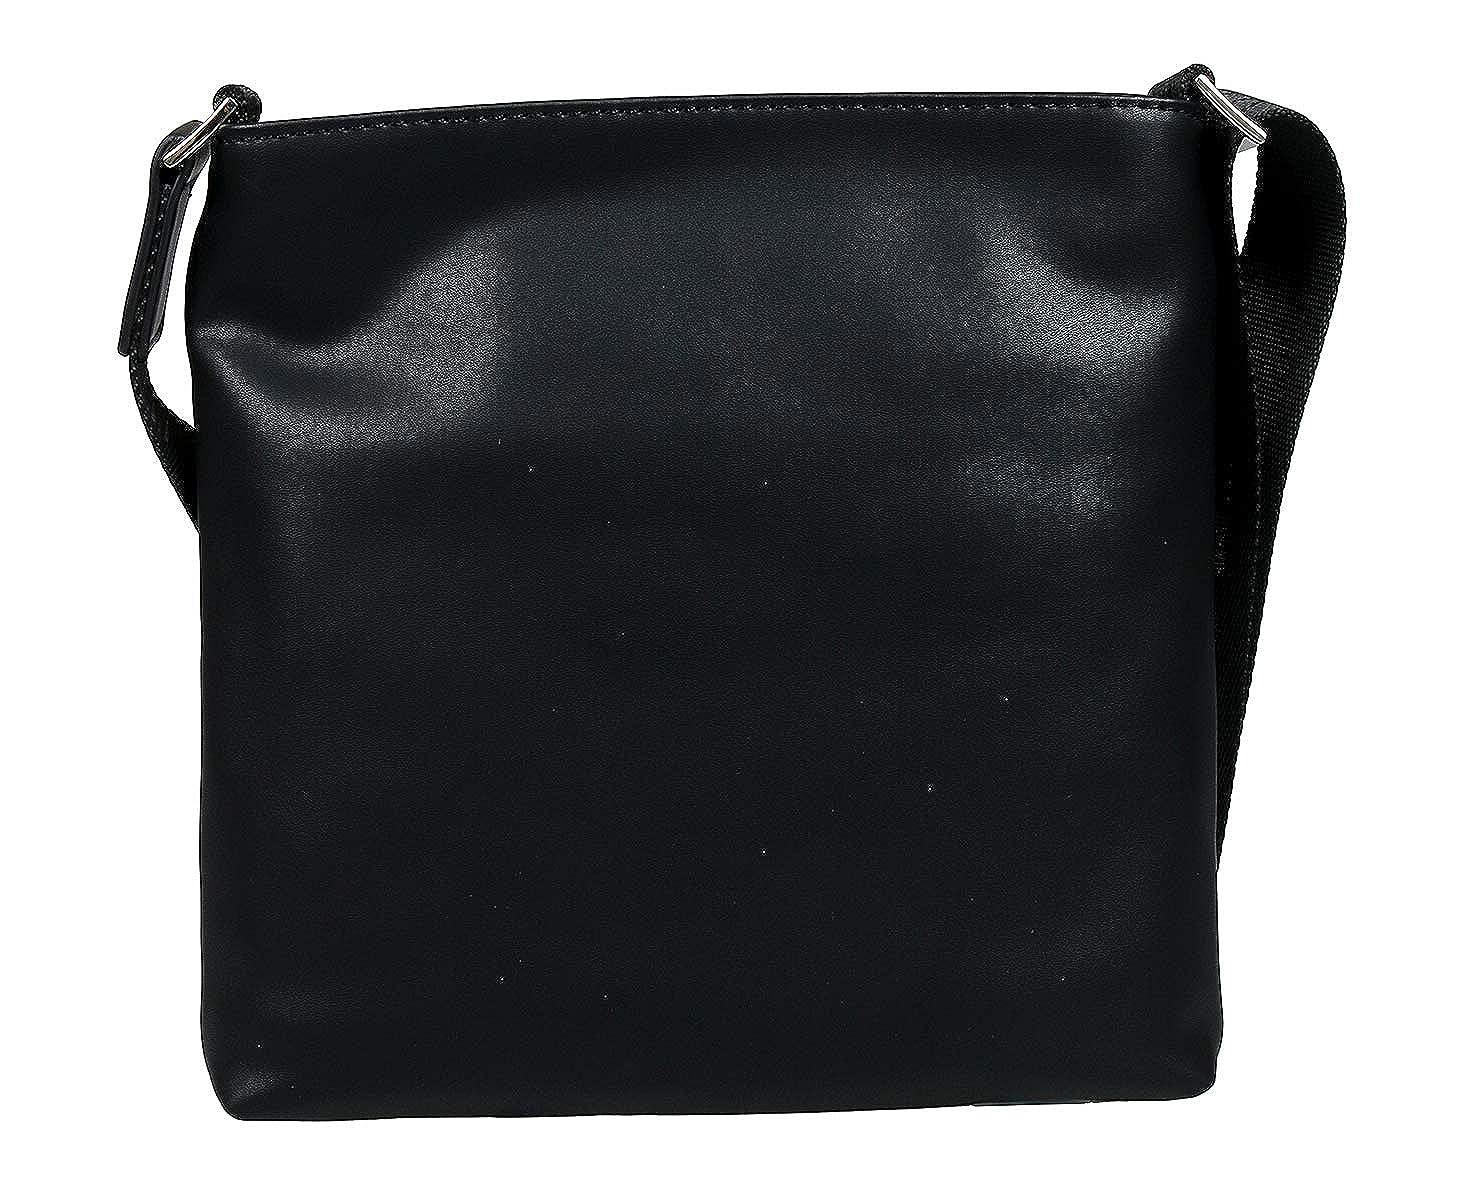 c03d0b50ba Amazon.com: Versace EE1YTBB01 E899 Black Crossbody Bag for Womens ...